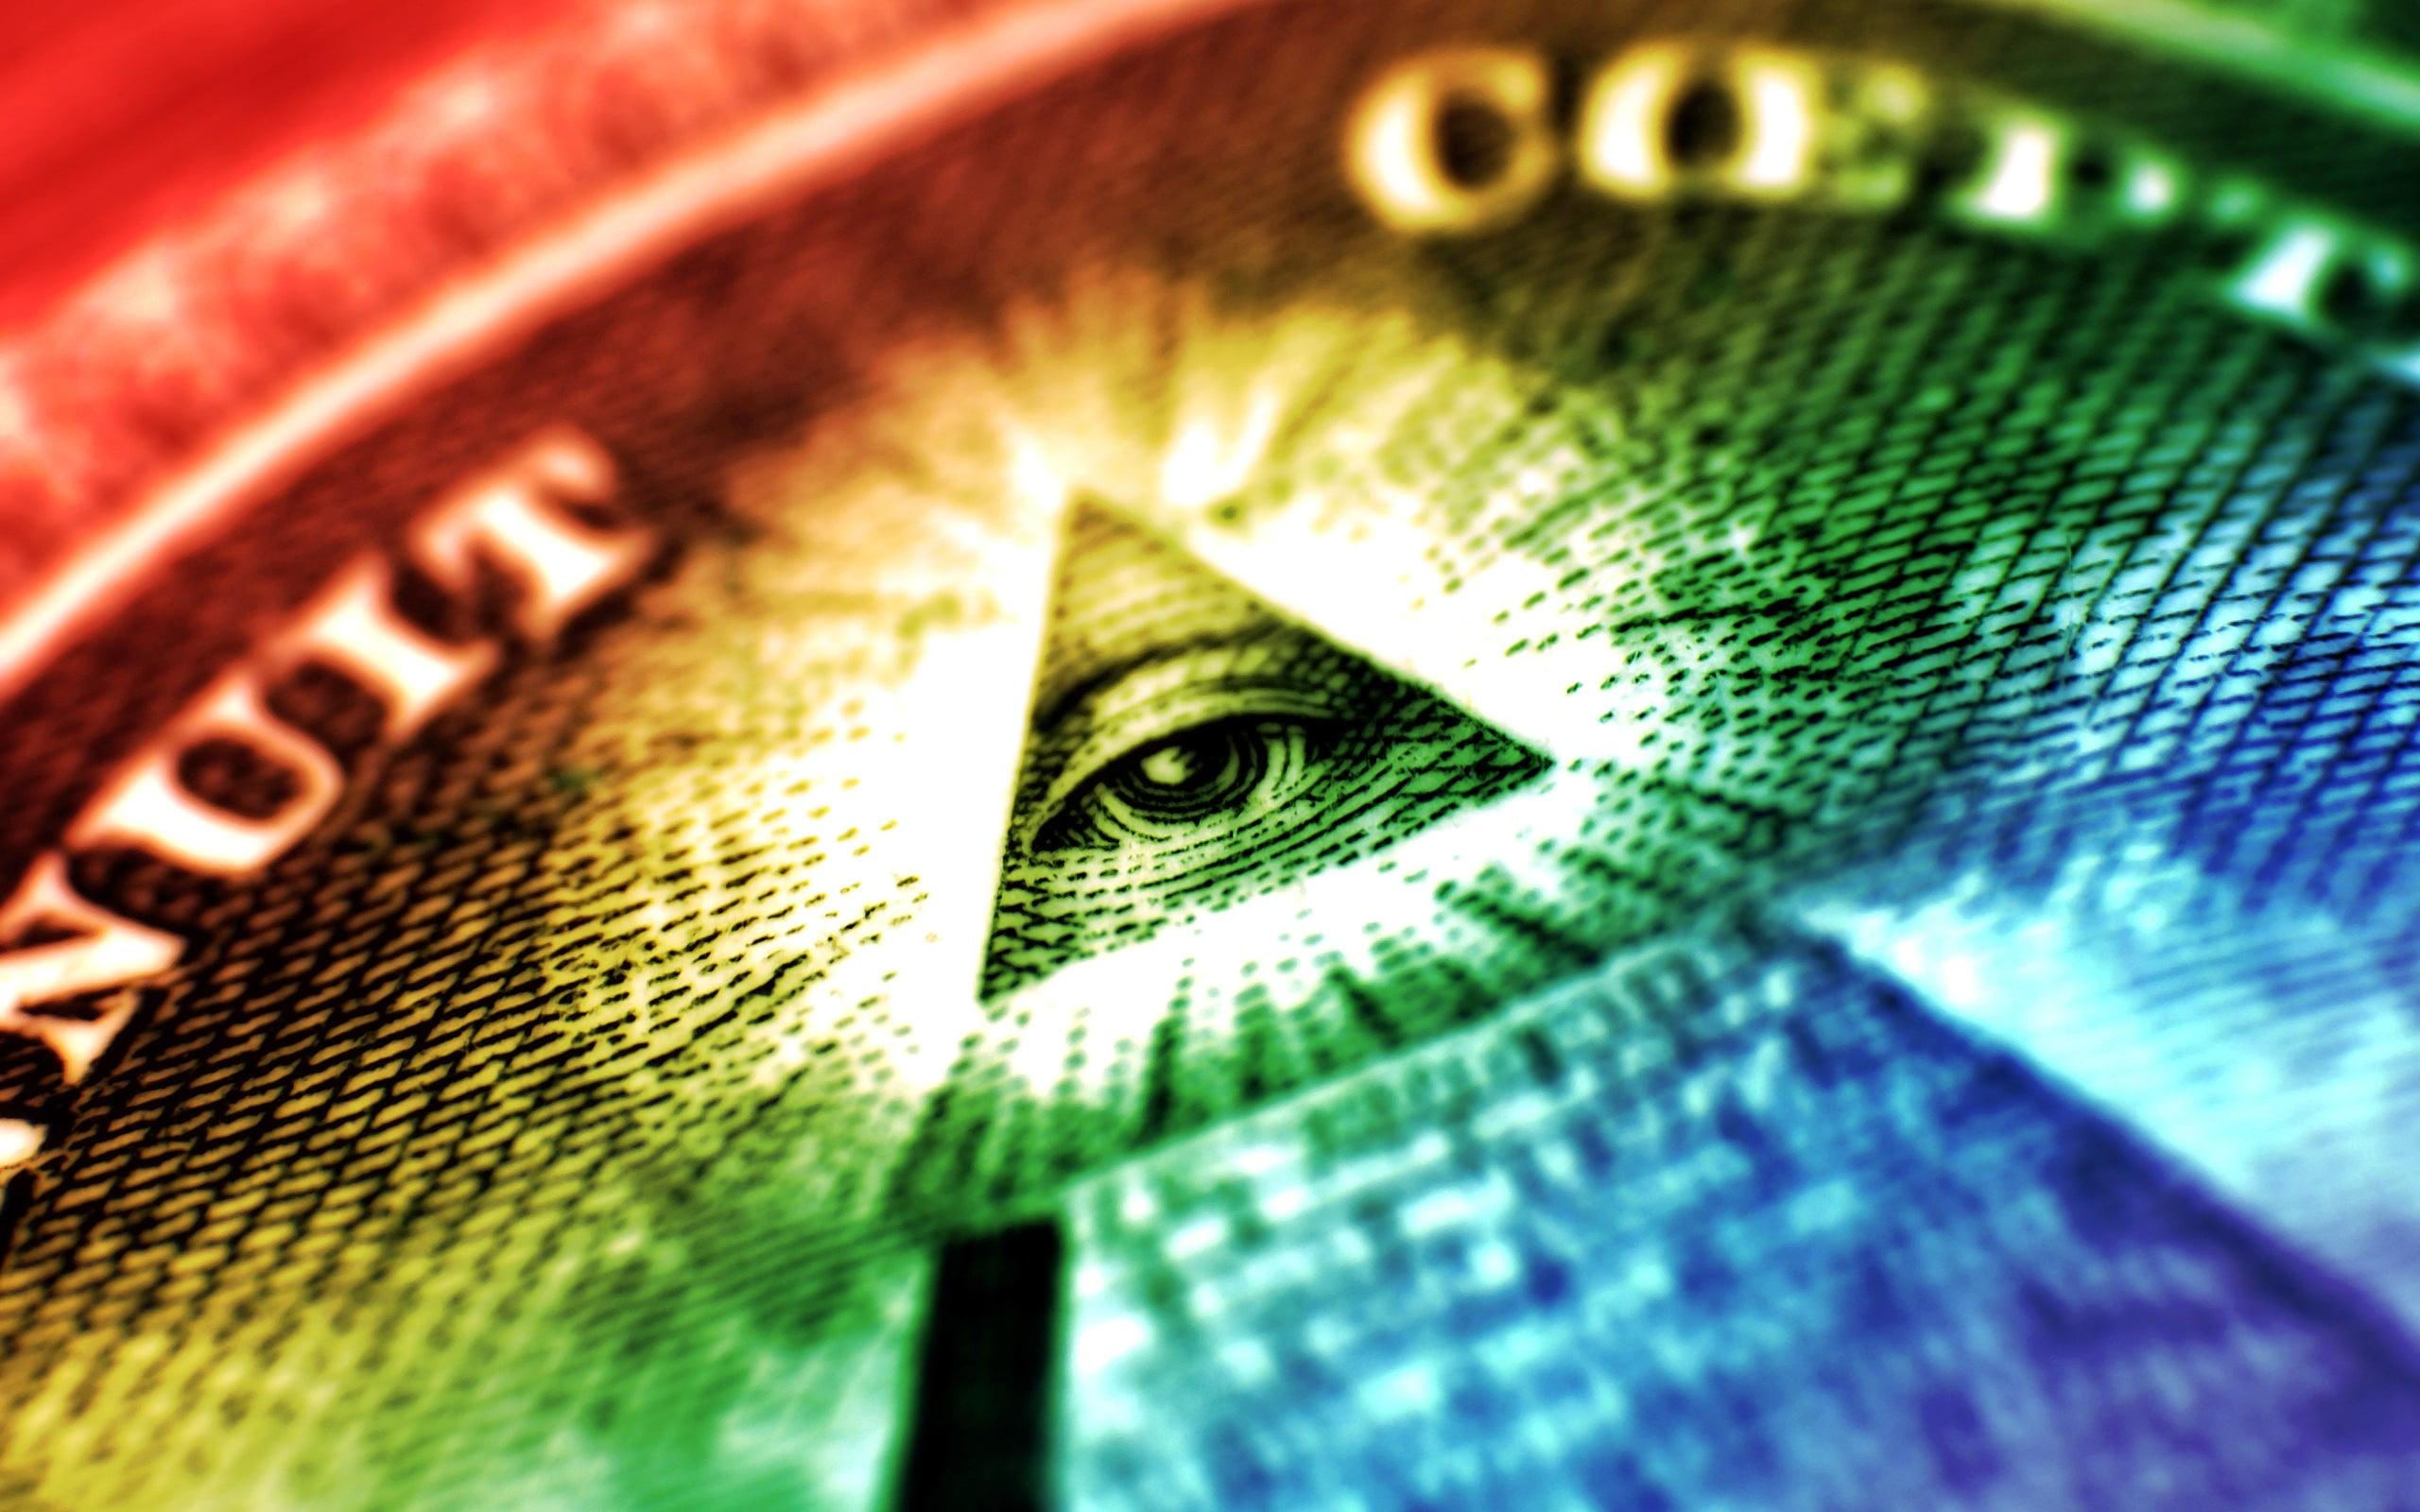 Eye of Providence Illuminati colorful HD wallpaper Wallpaper Flare 2560x1600